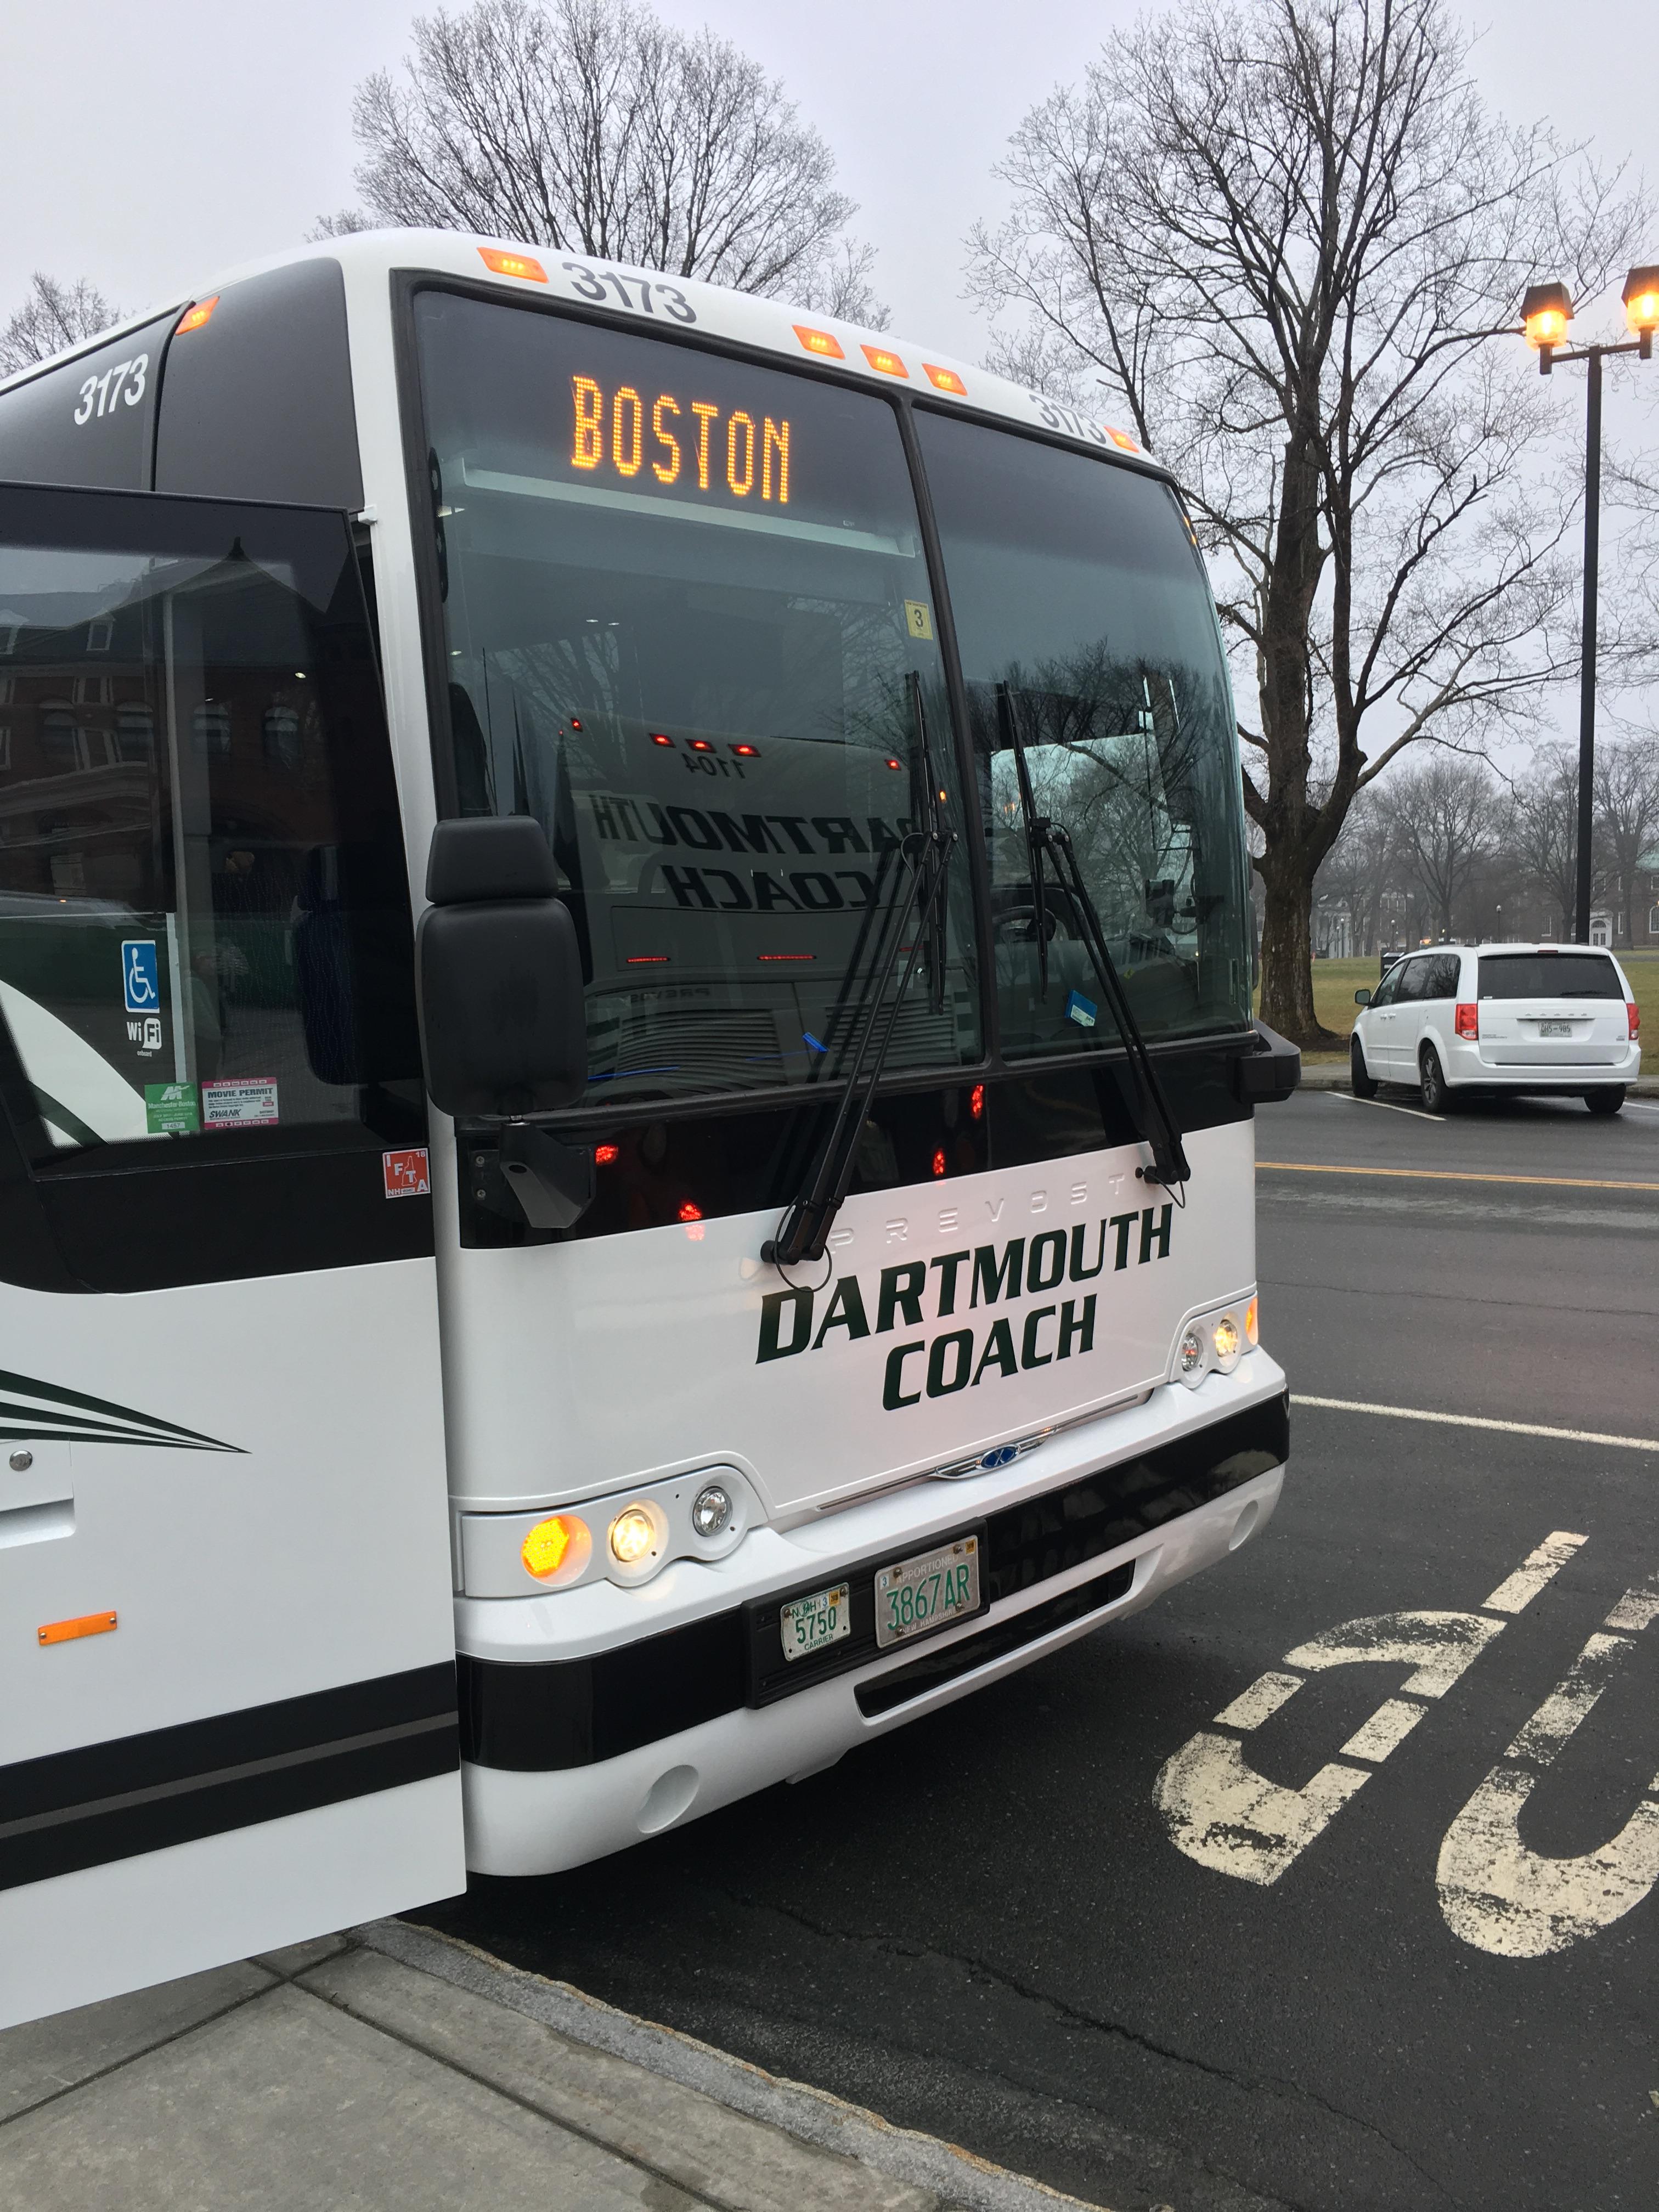 boston trip / visite à boston | echange hanover-joigny exchange